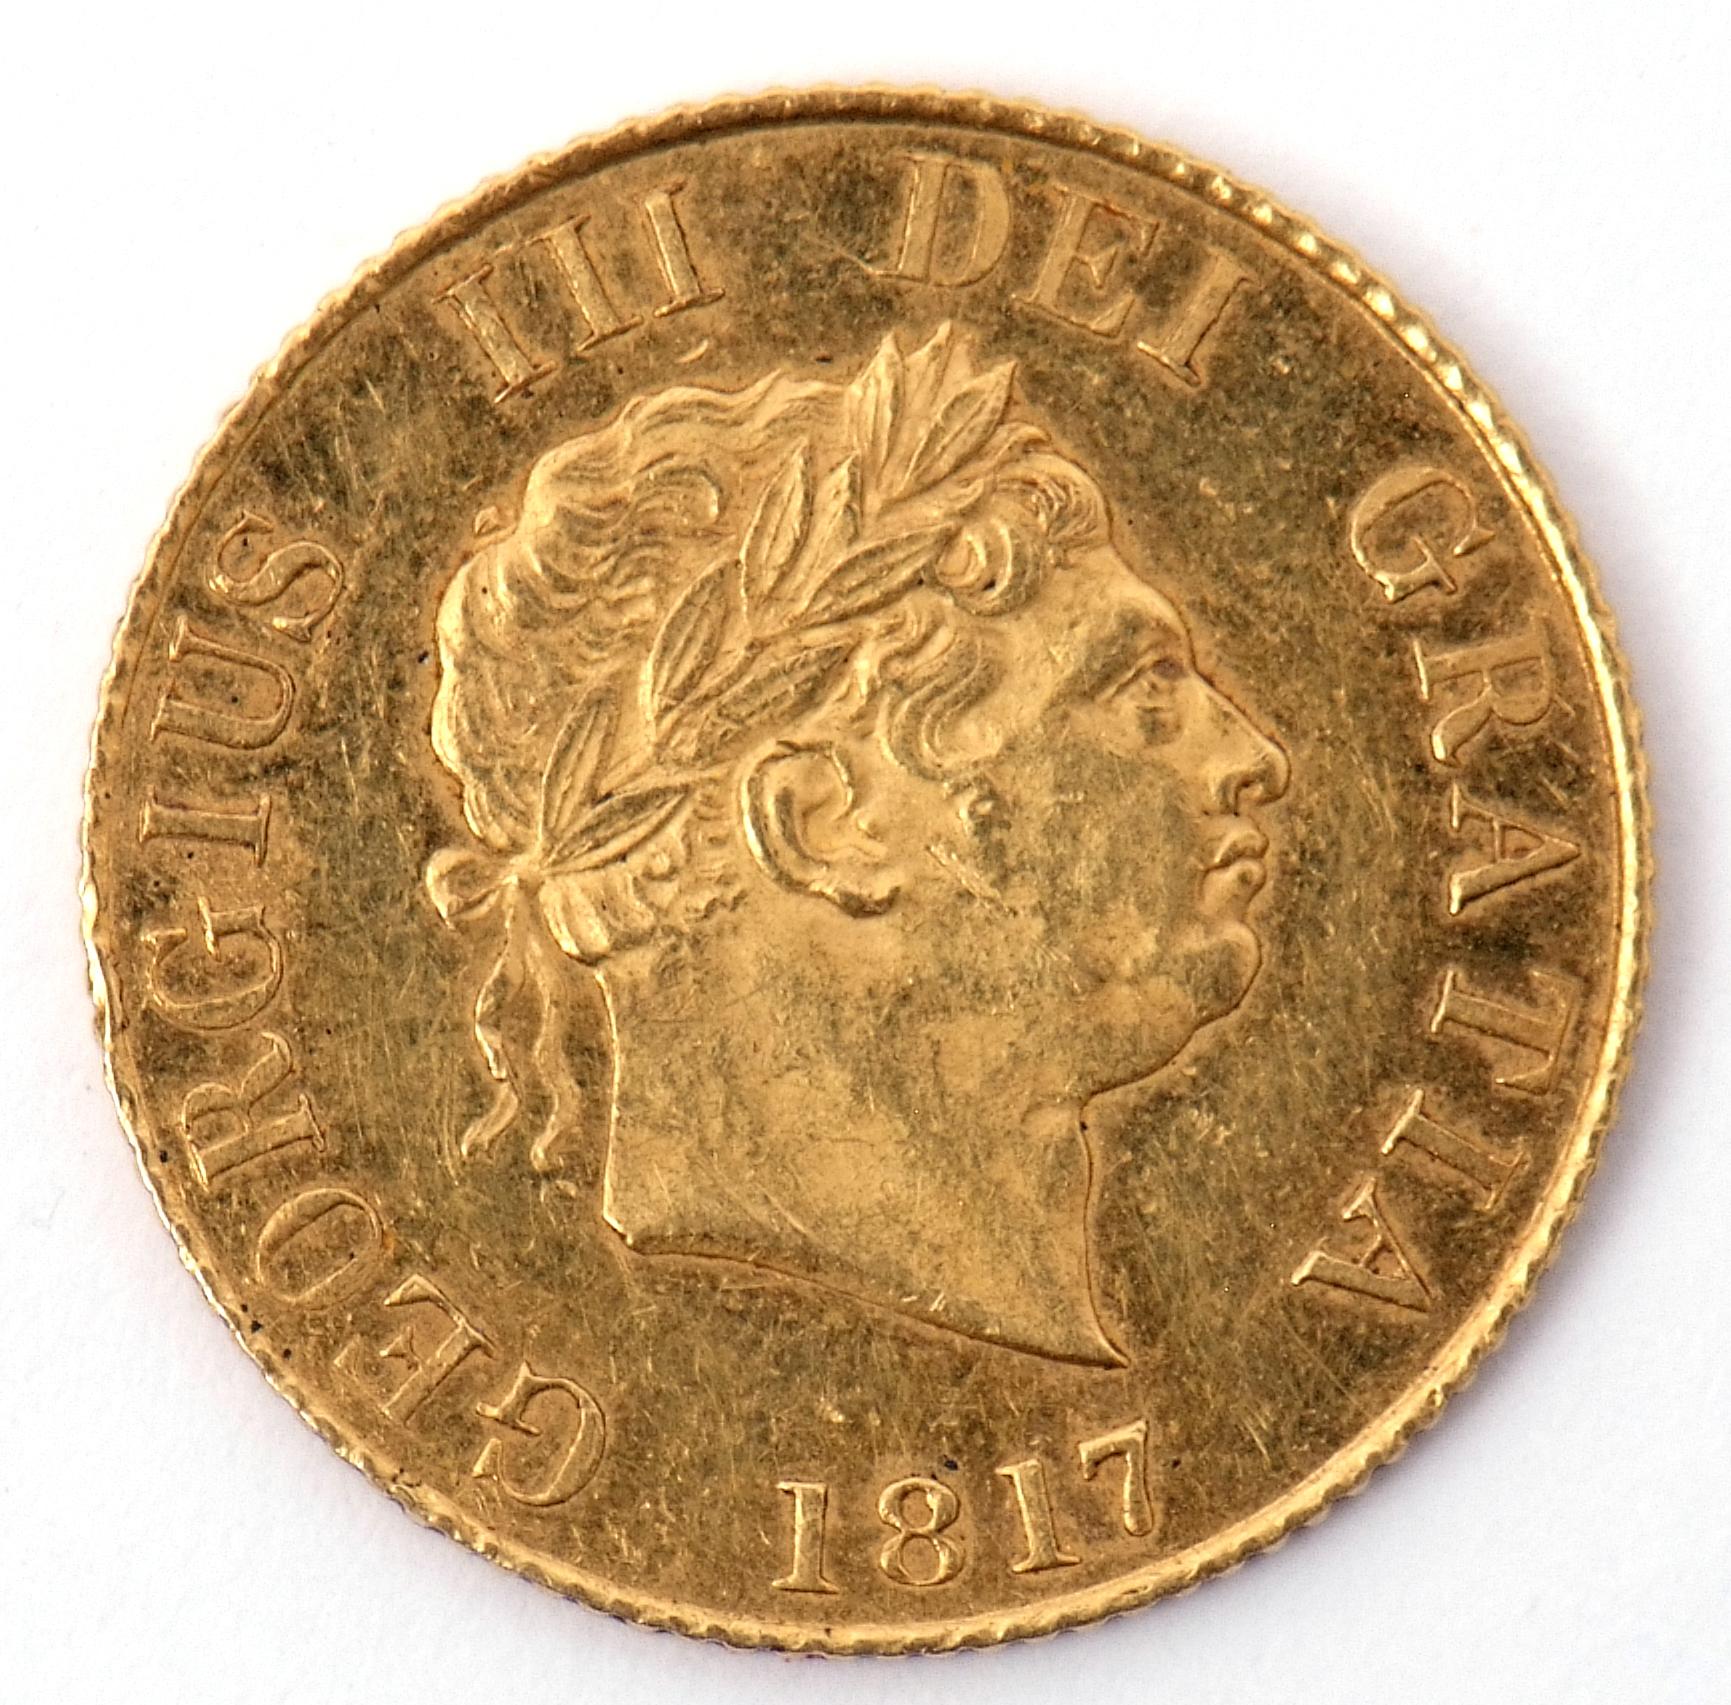 George III Gold Half Sovereign Dated 1817, Laureate Head